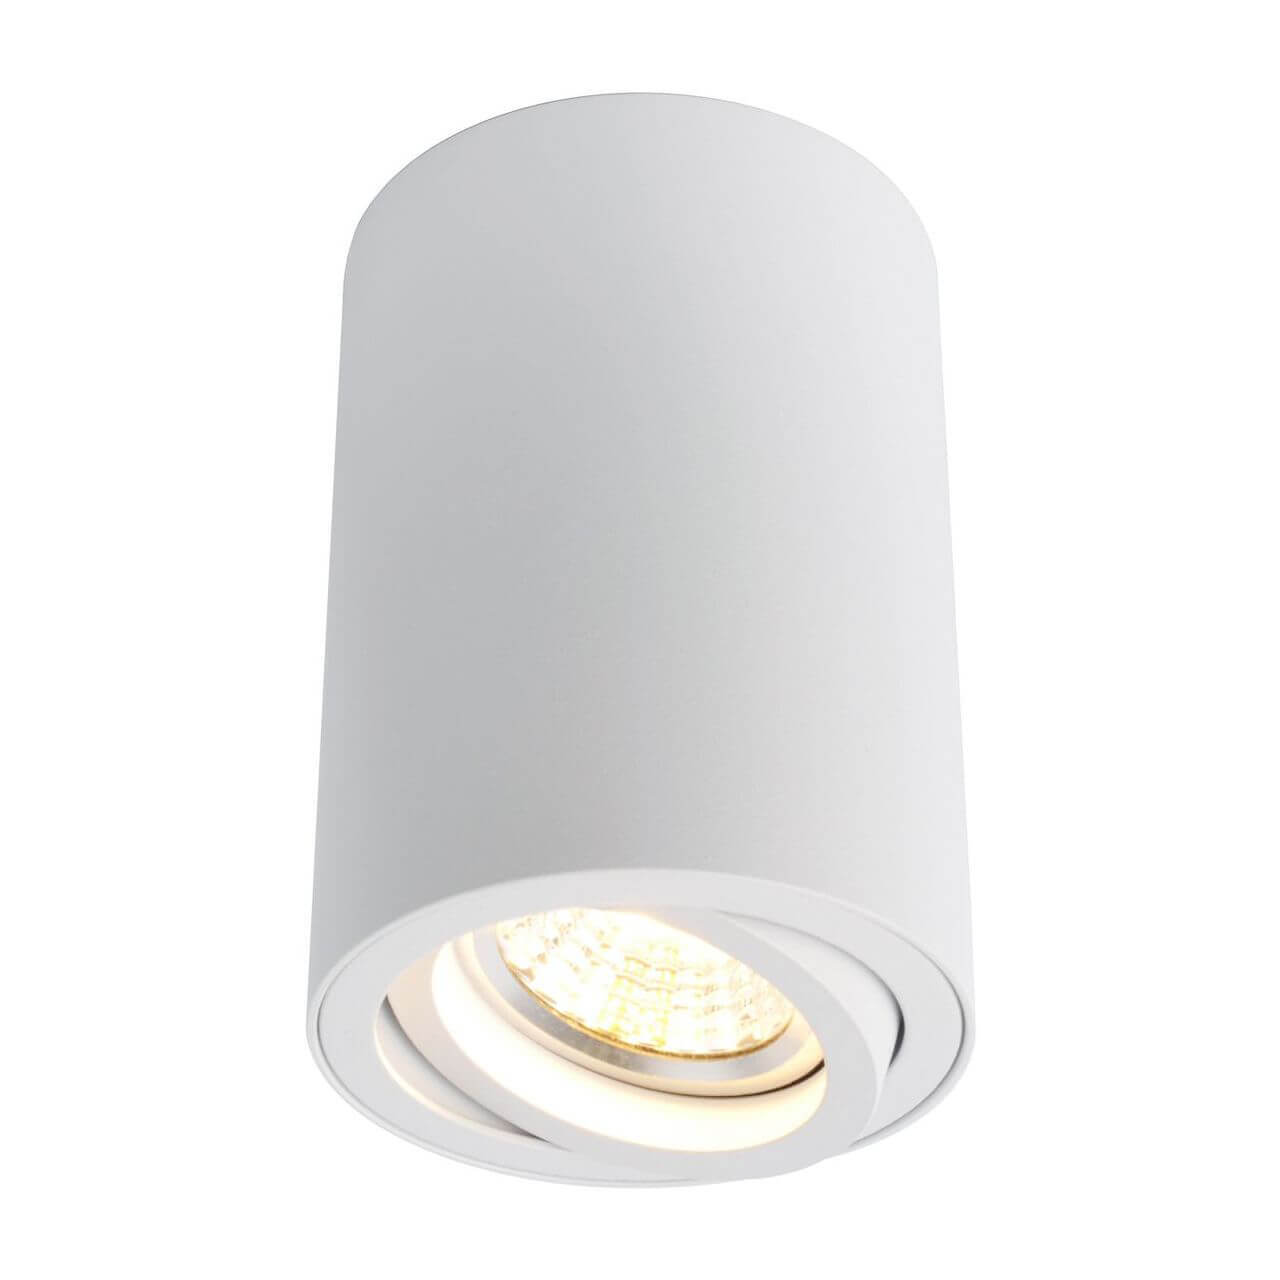 цена на Светильник Arte Lamp A1560PL-1WH 1560